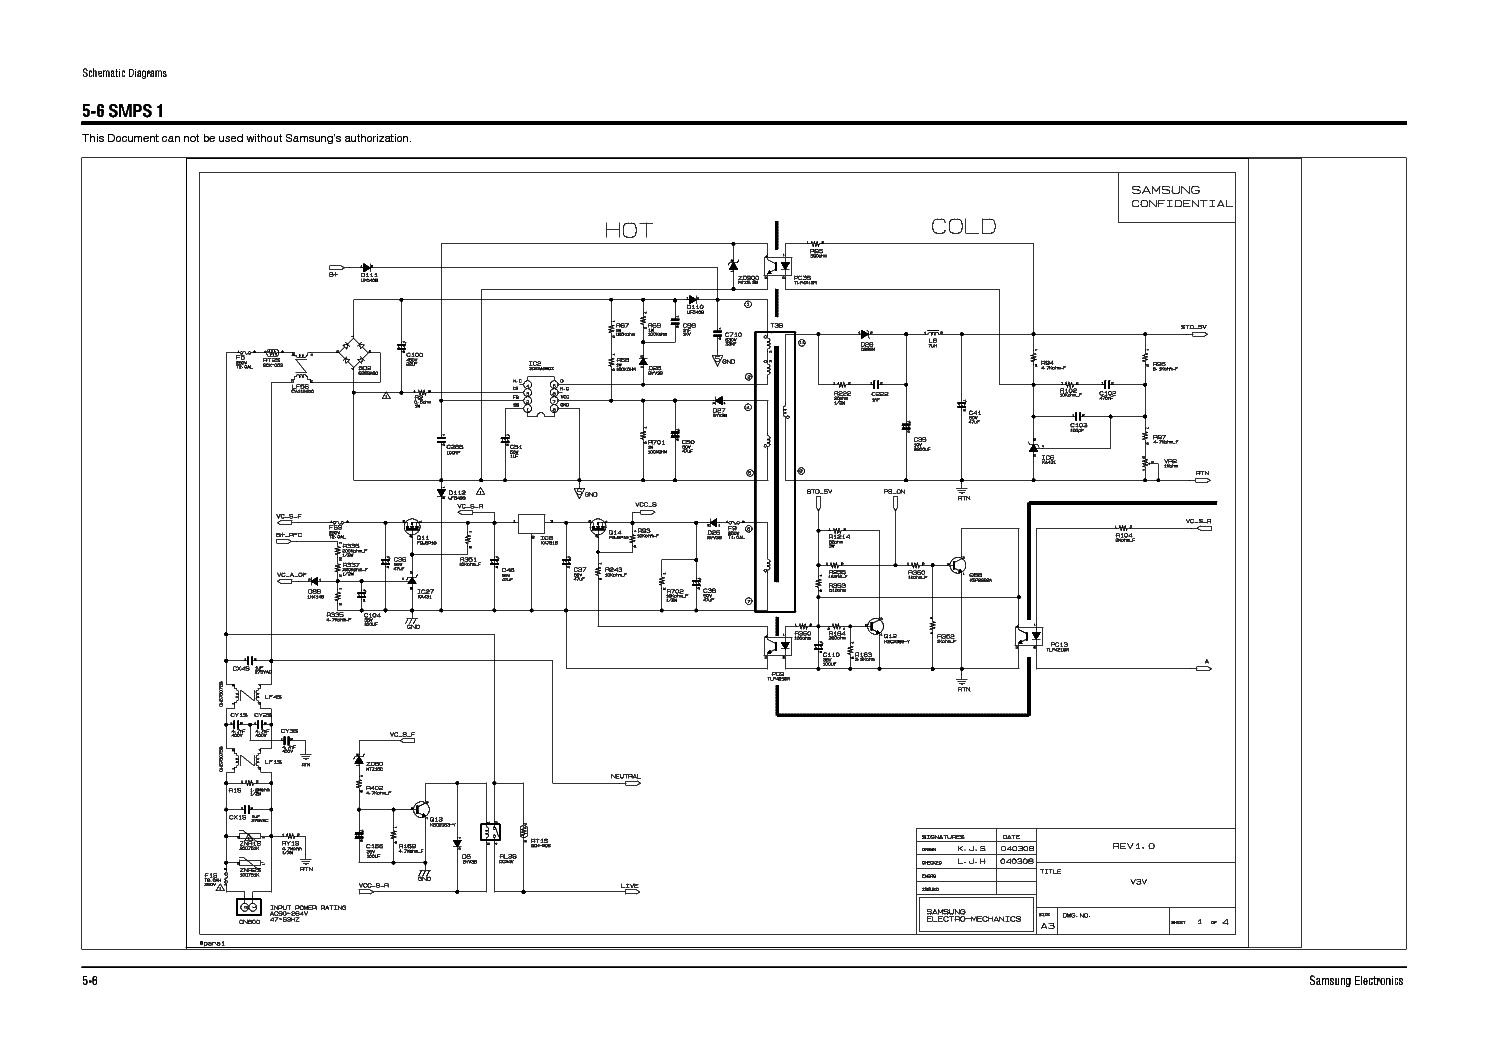 Samsung Bn44 A Rev 1 0 Pwr Sch Service Manual